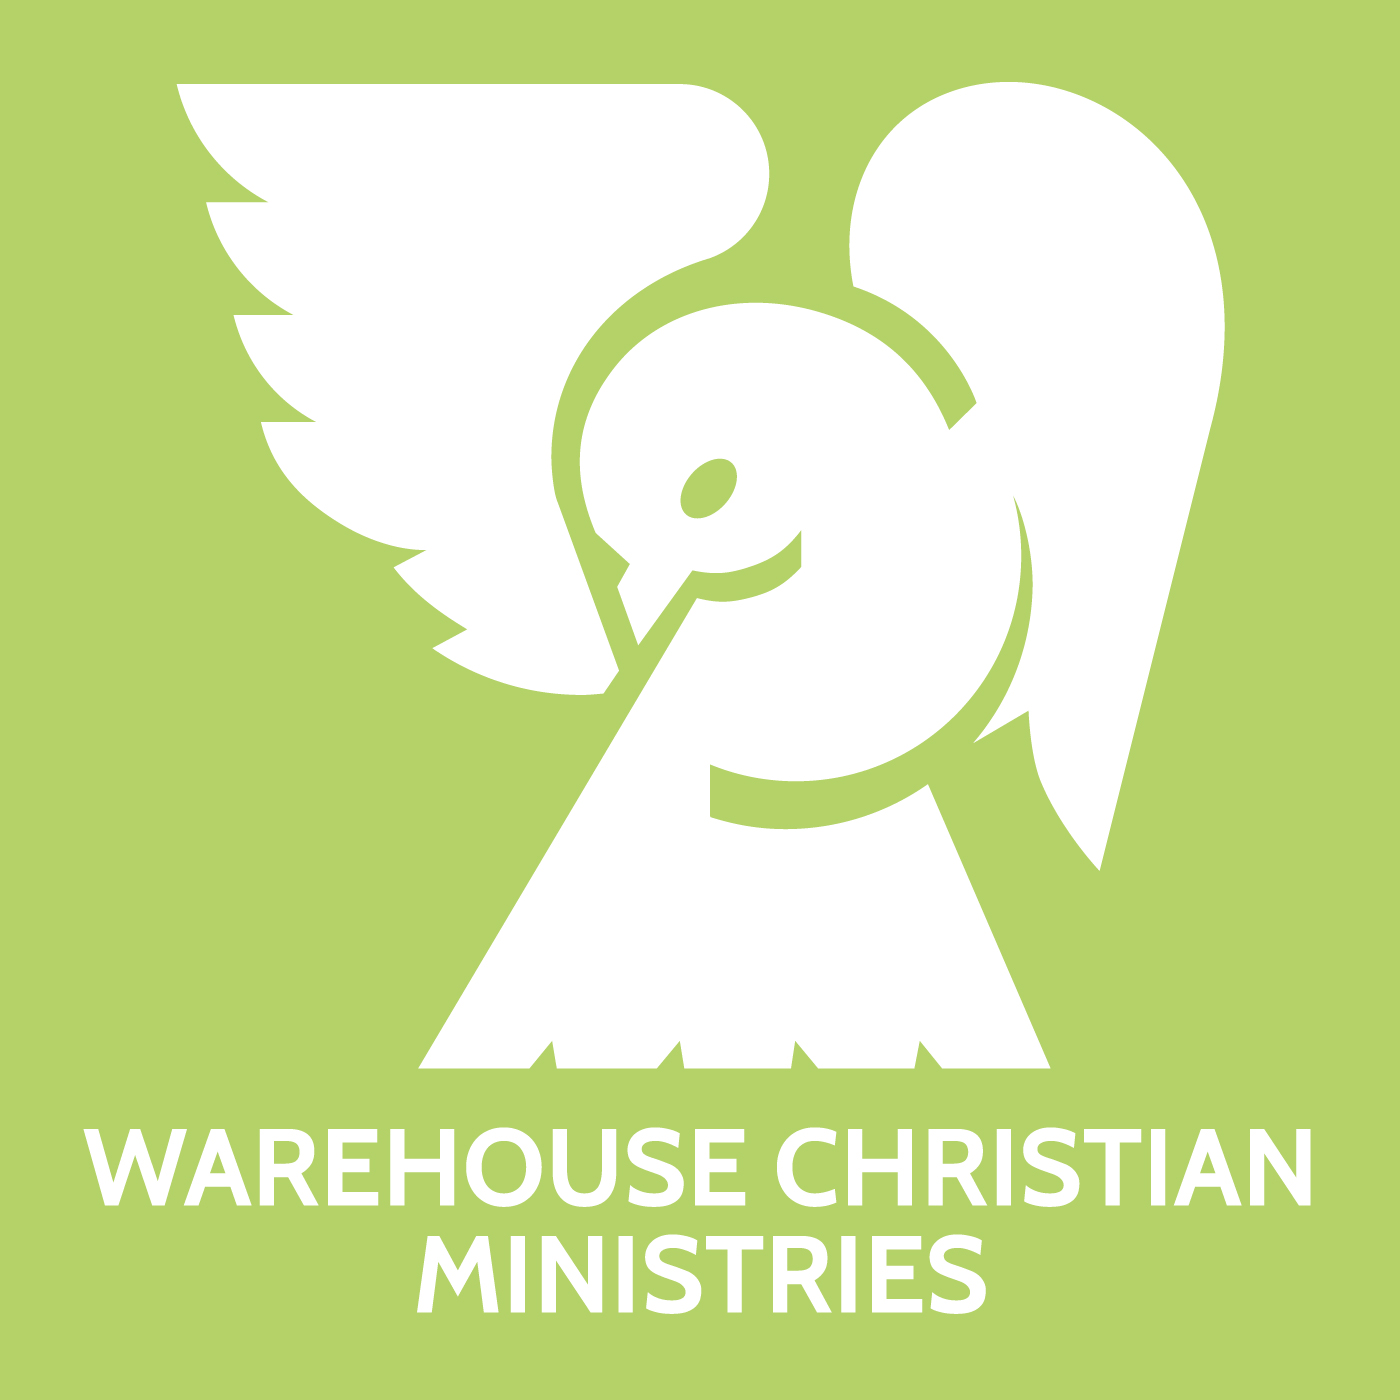 Warehouse Christian Ministries